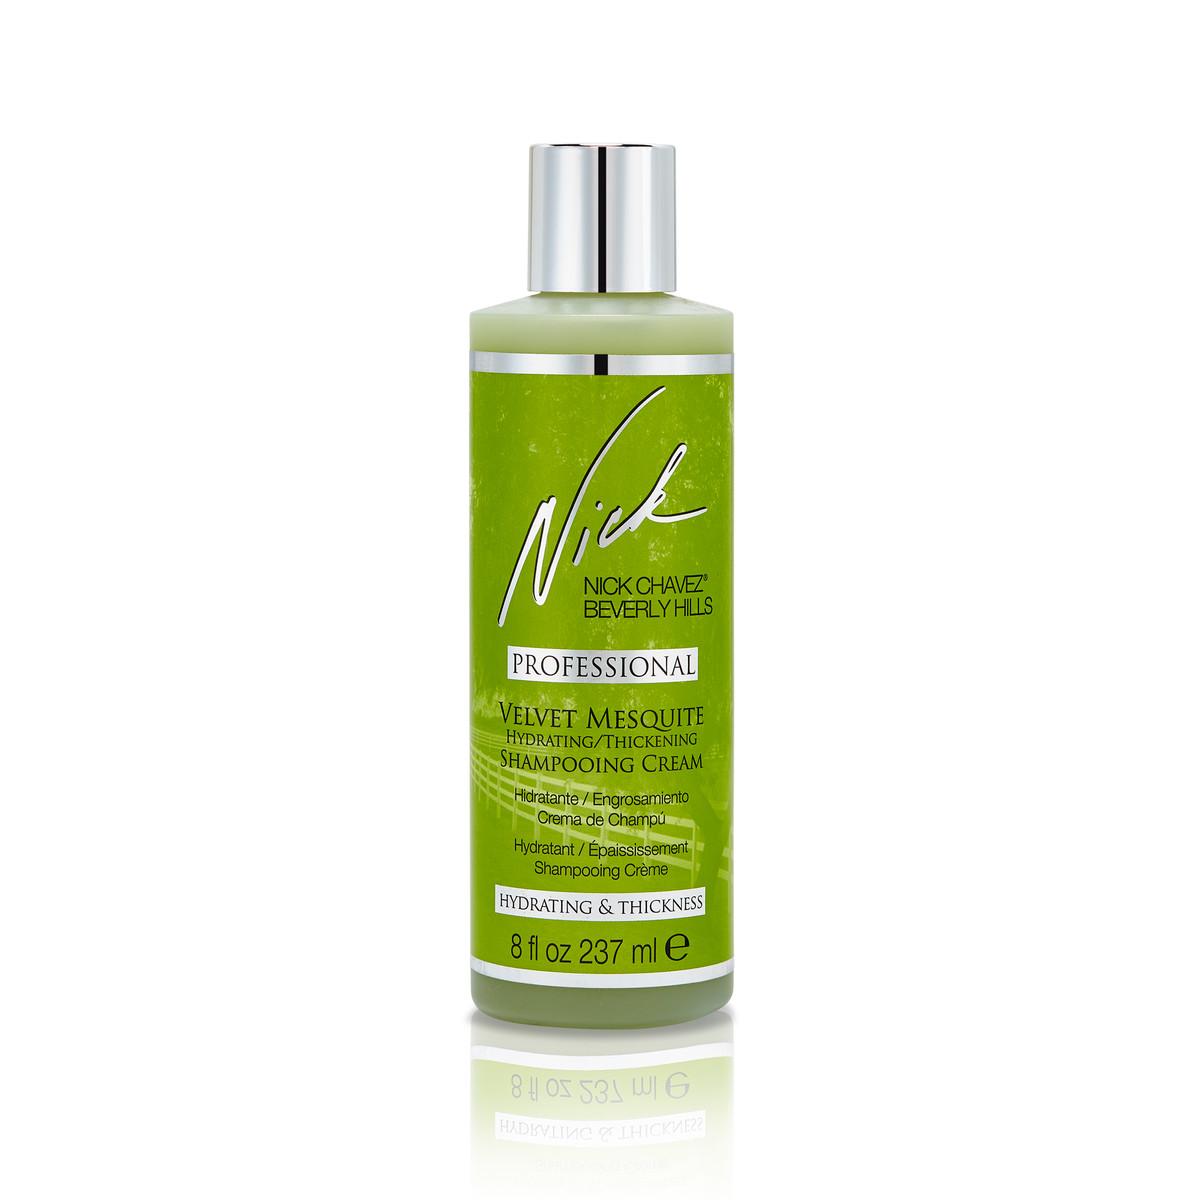 8oz Velvet Mesquite Hydrating Thickening Shampooing Creme